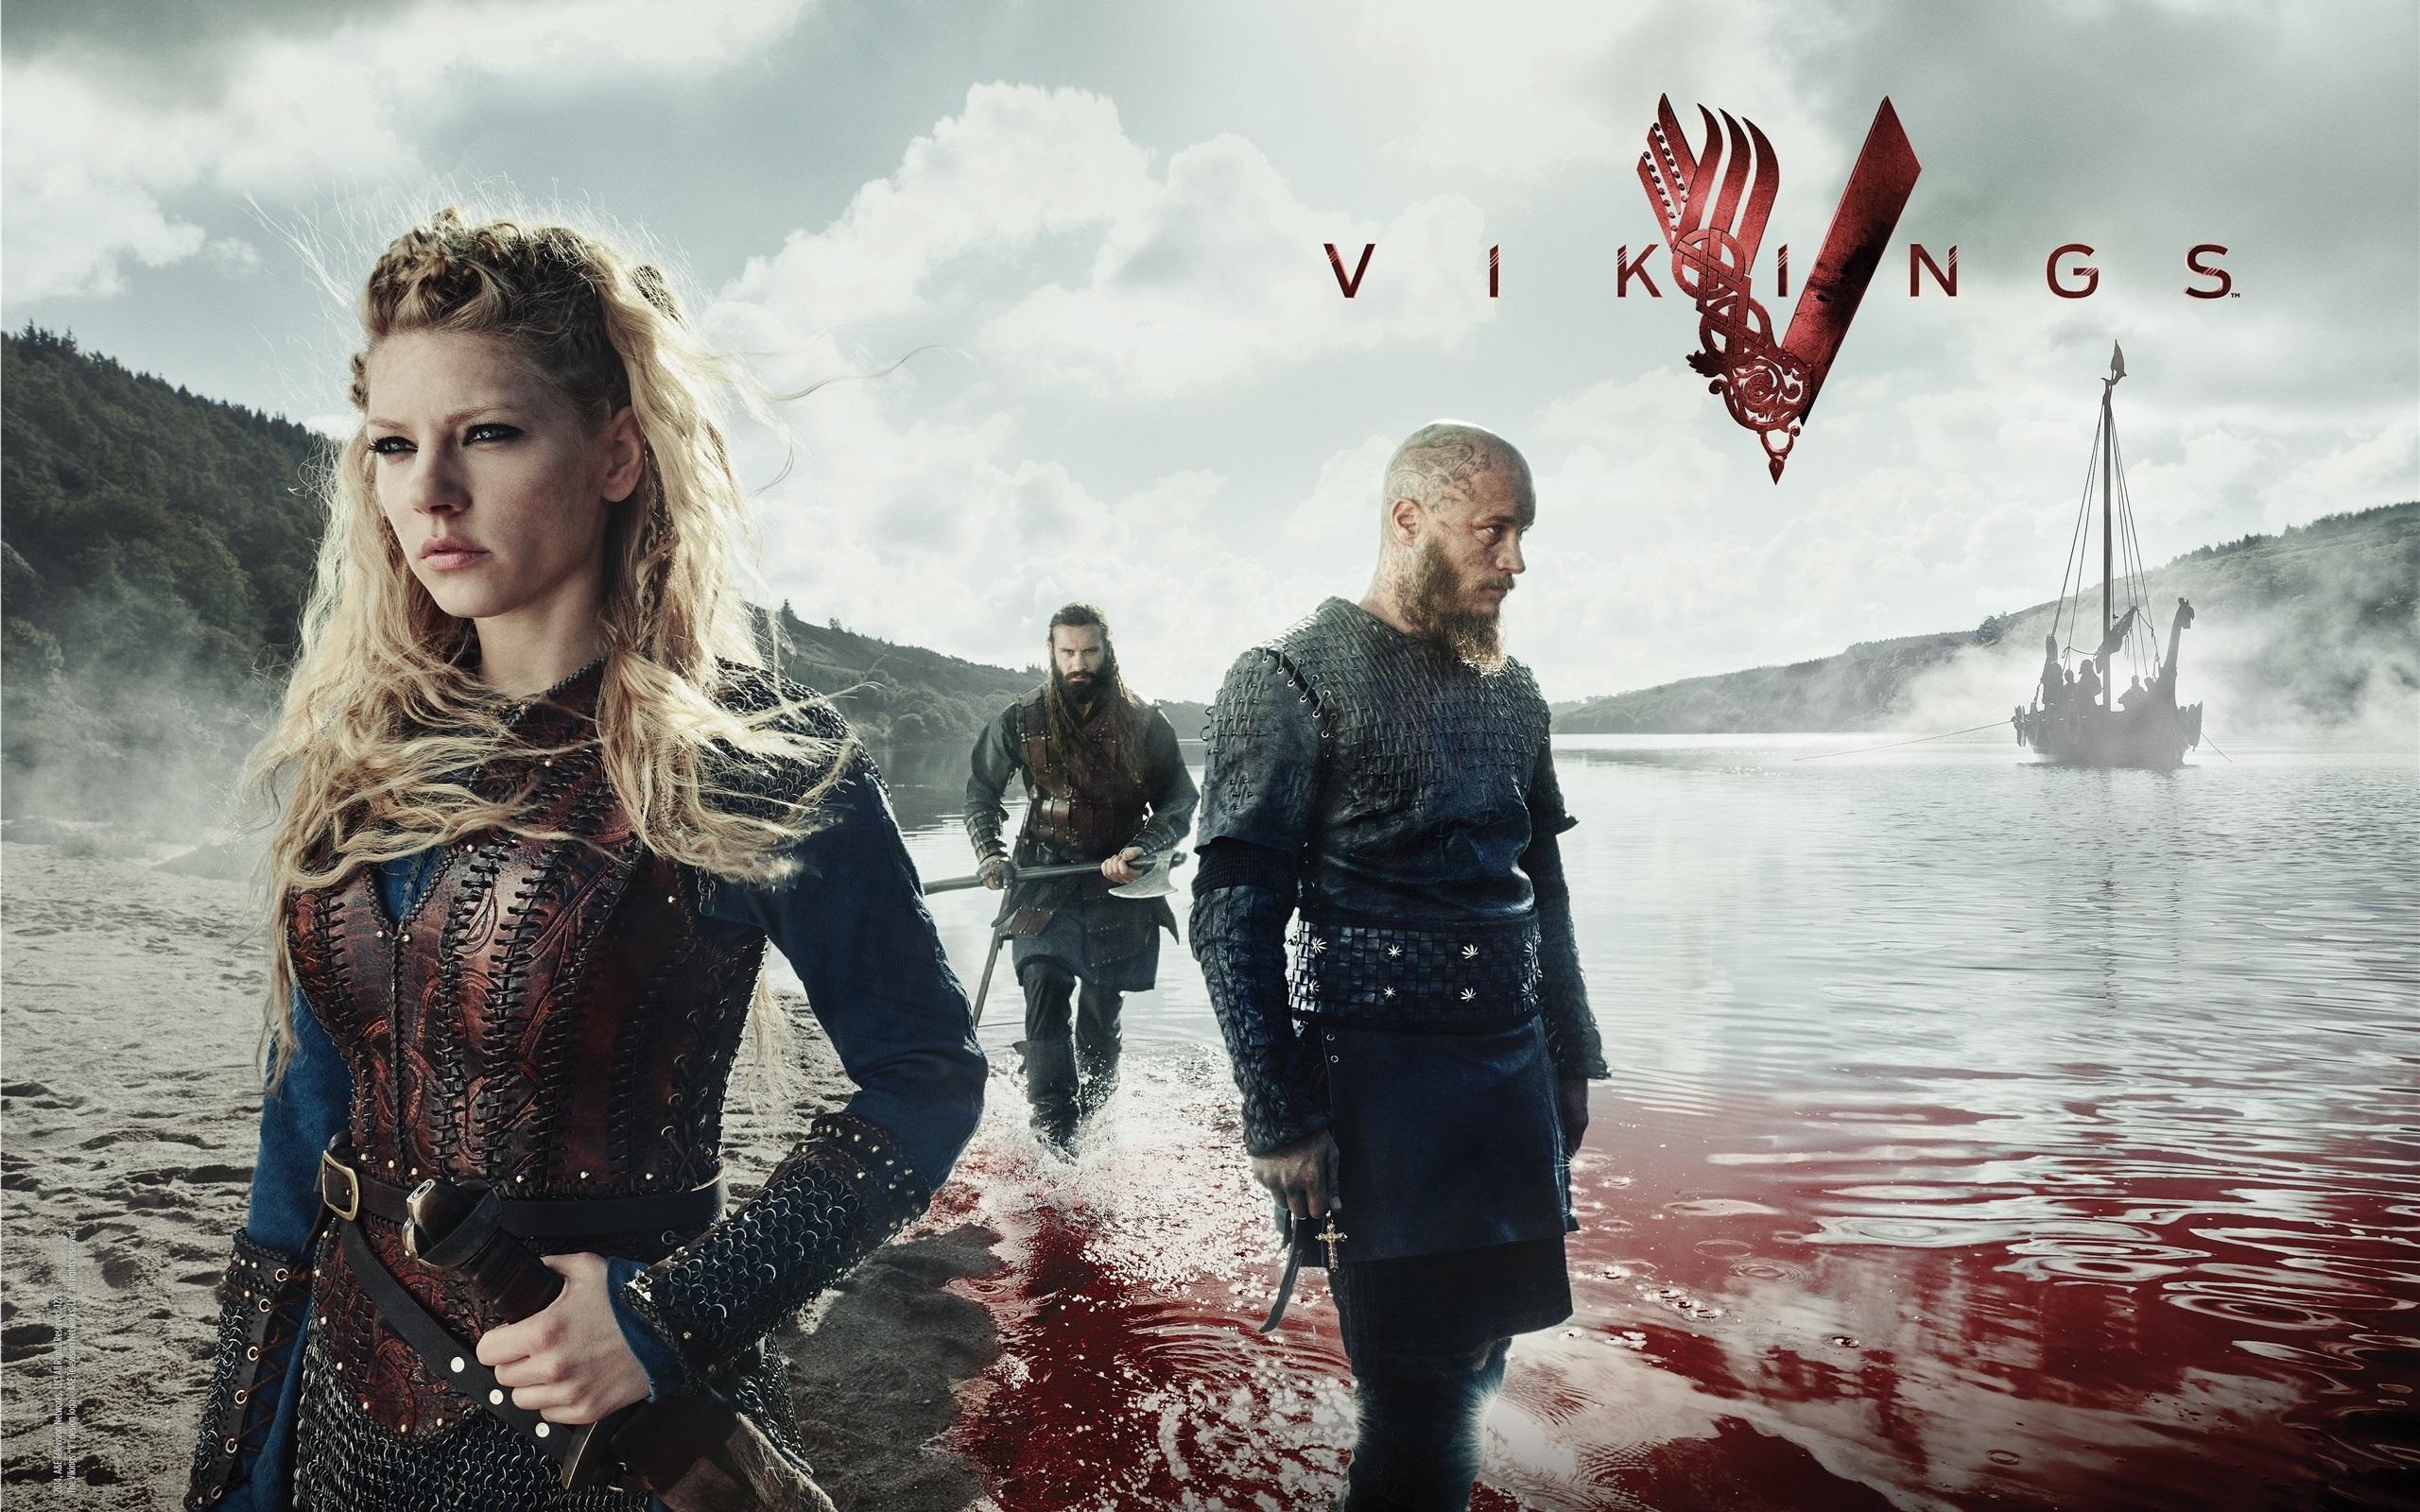 Wallpaper Vikings Tv Series Fjord Blood 2560x1600 Hd